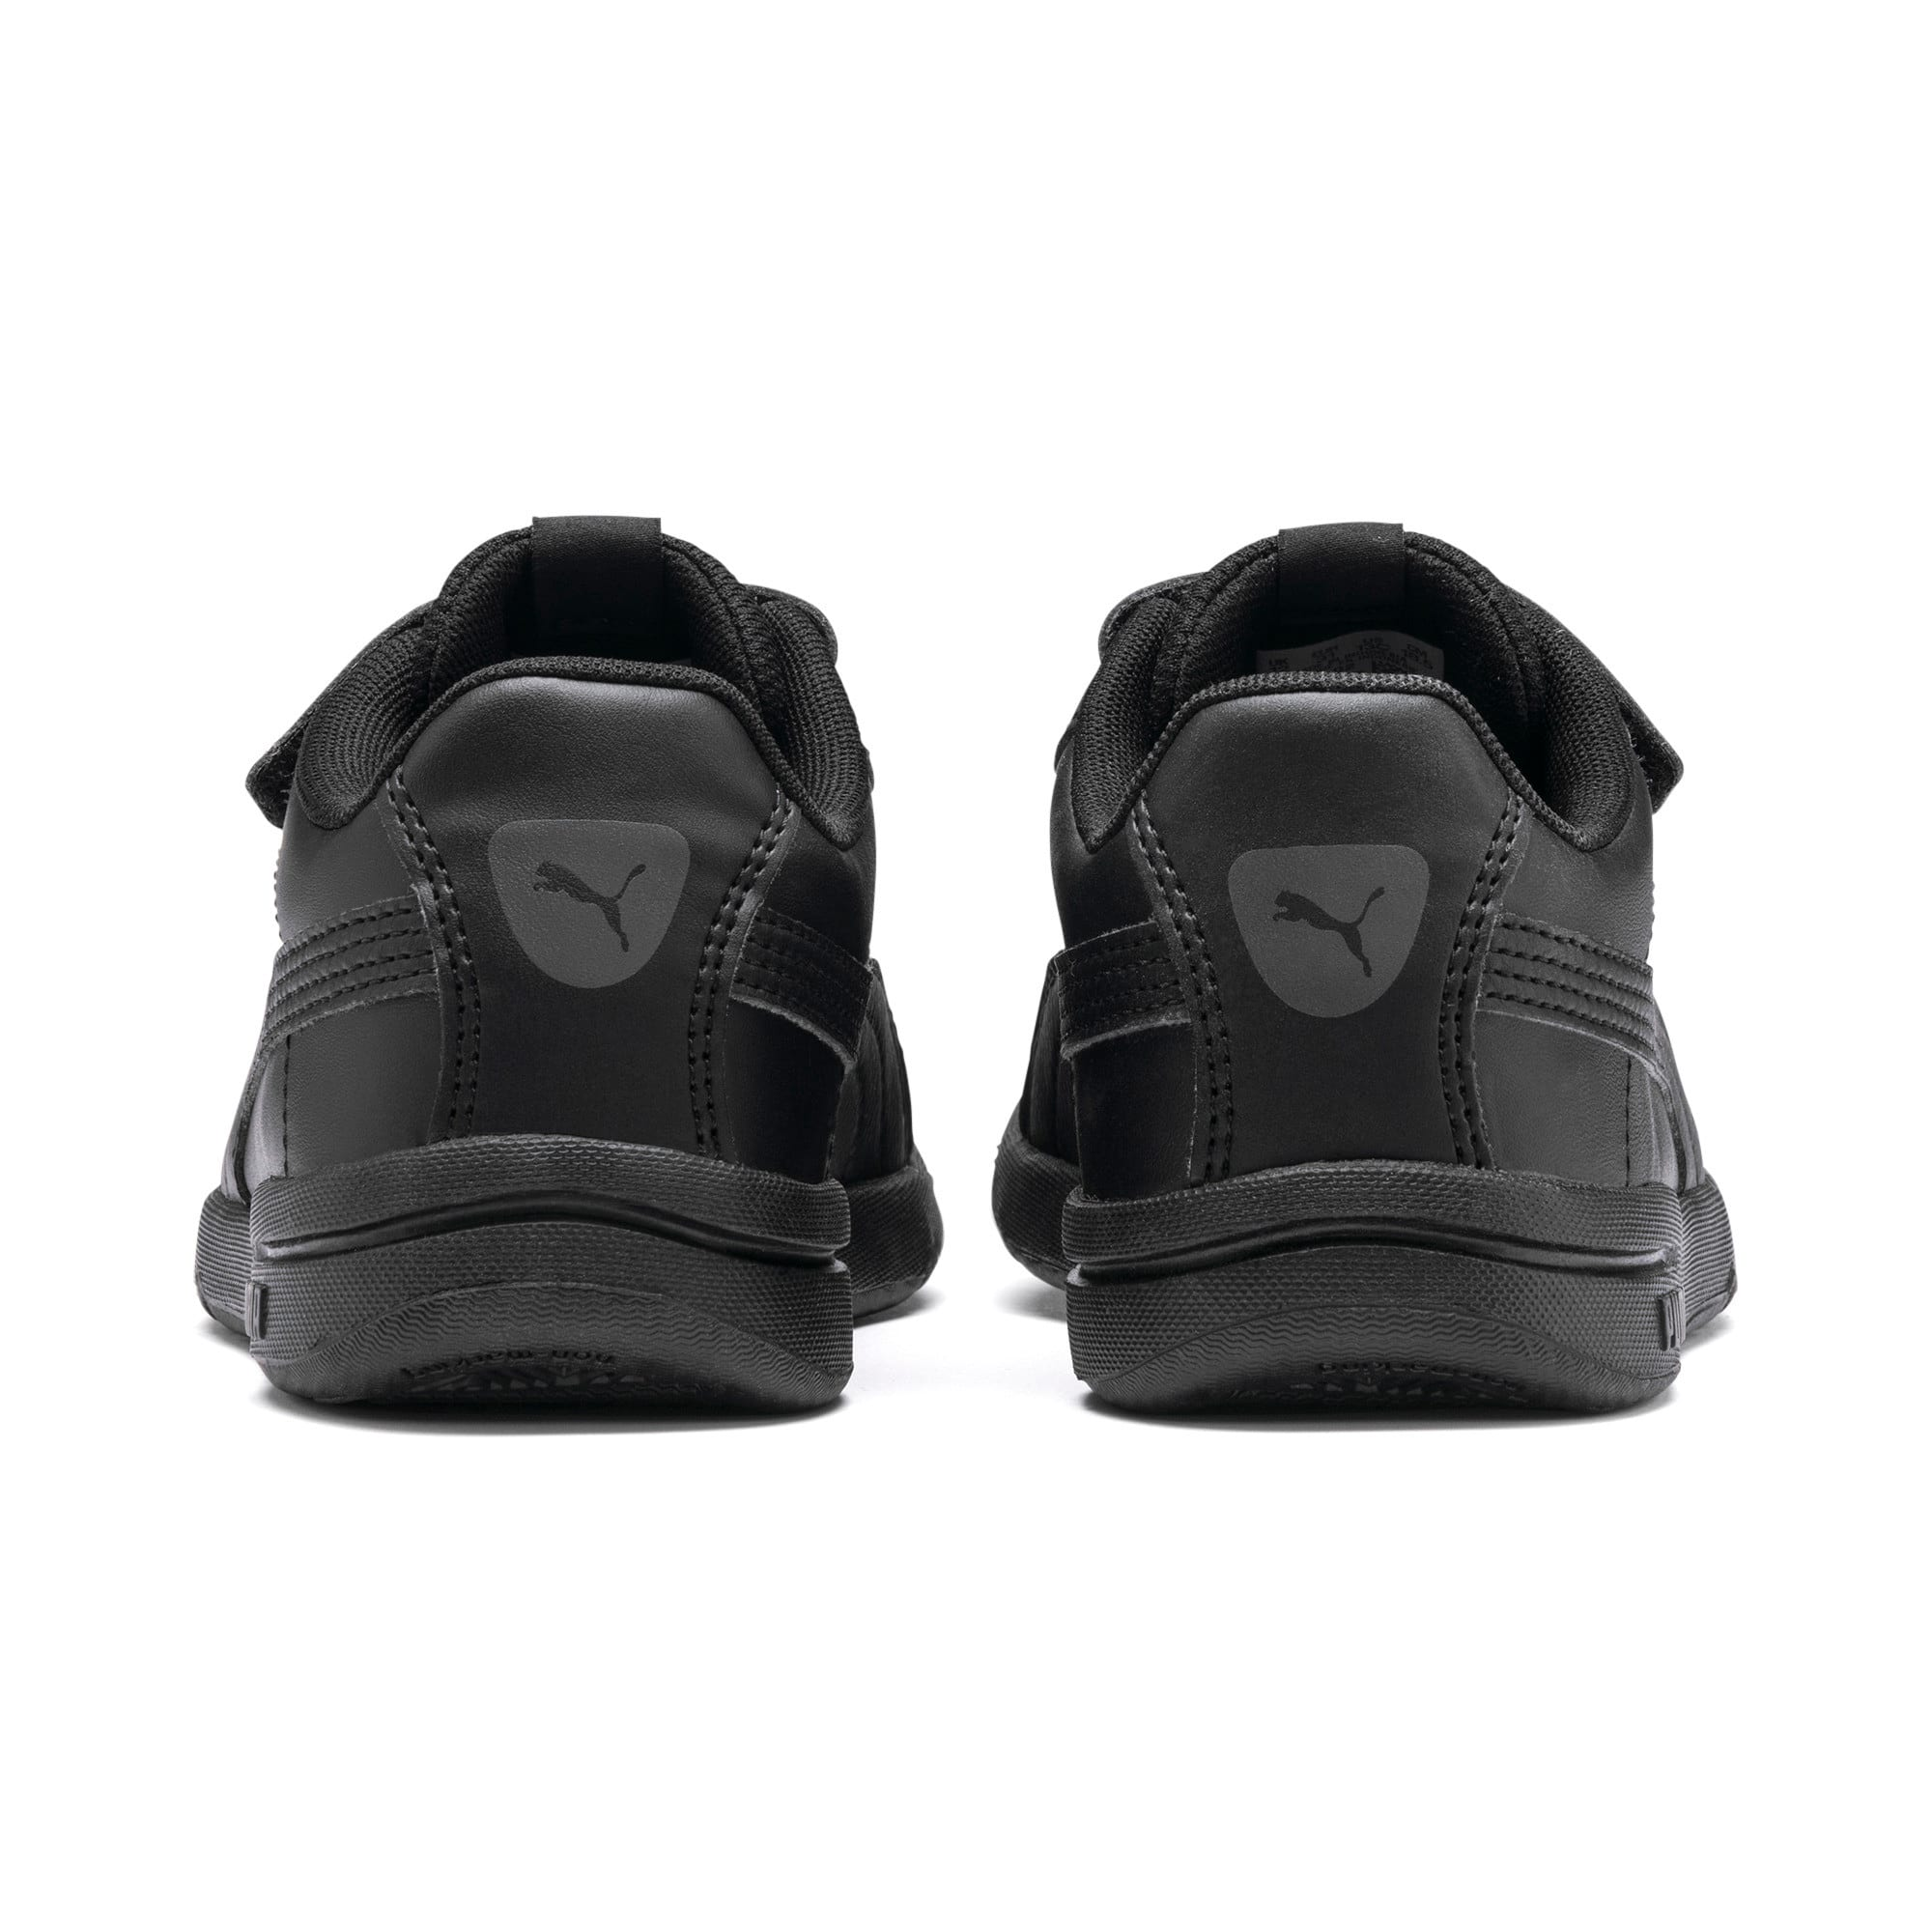 Thumbnail 3 of Basket Stepfleex 2 SL VE V Kids, Puma Black-Puma Black, medium